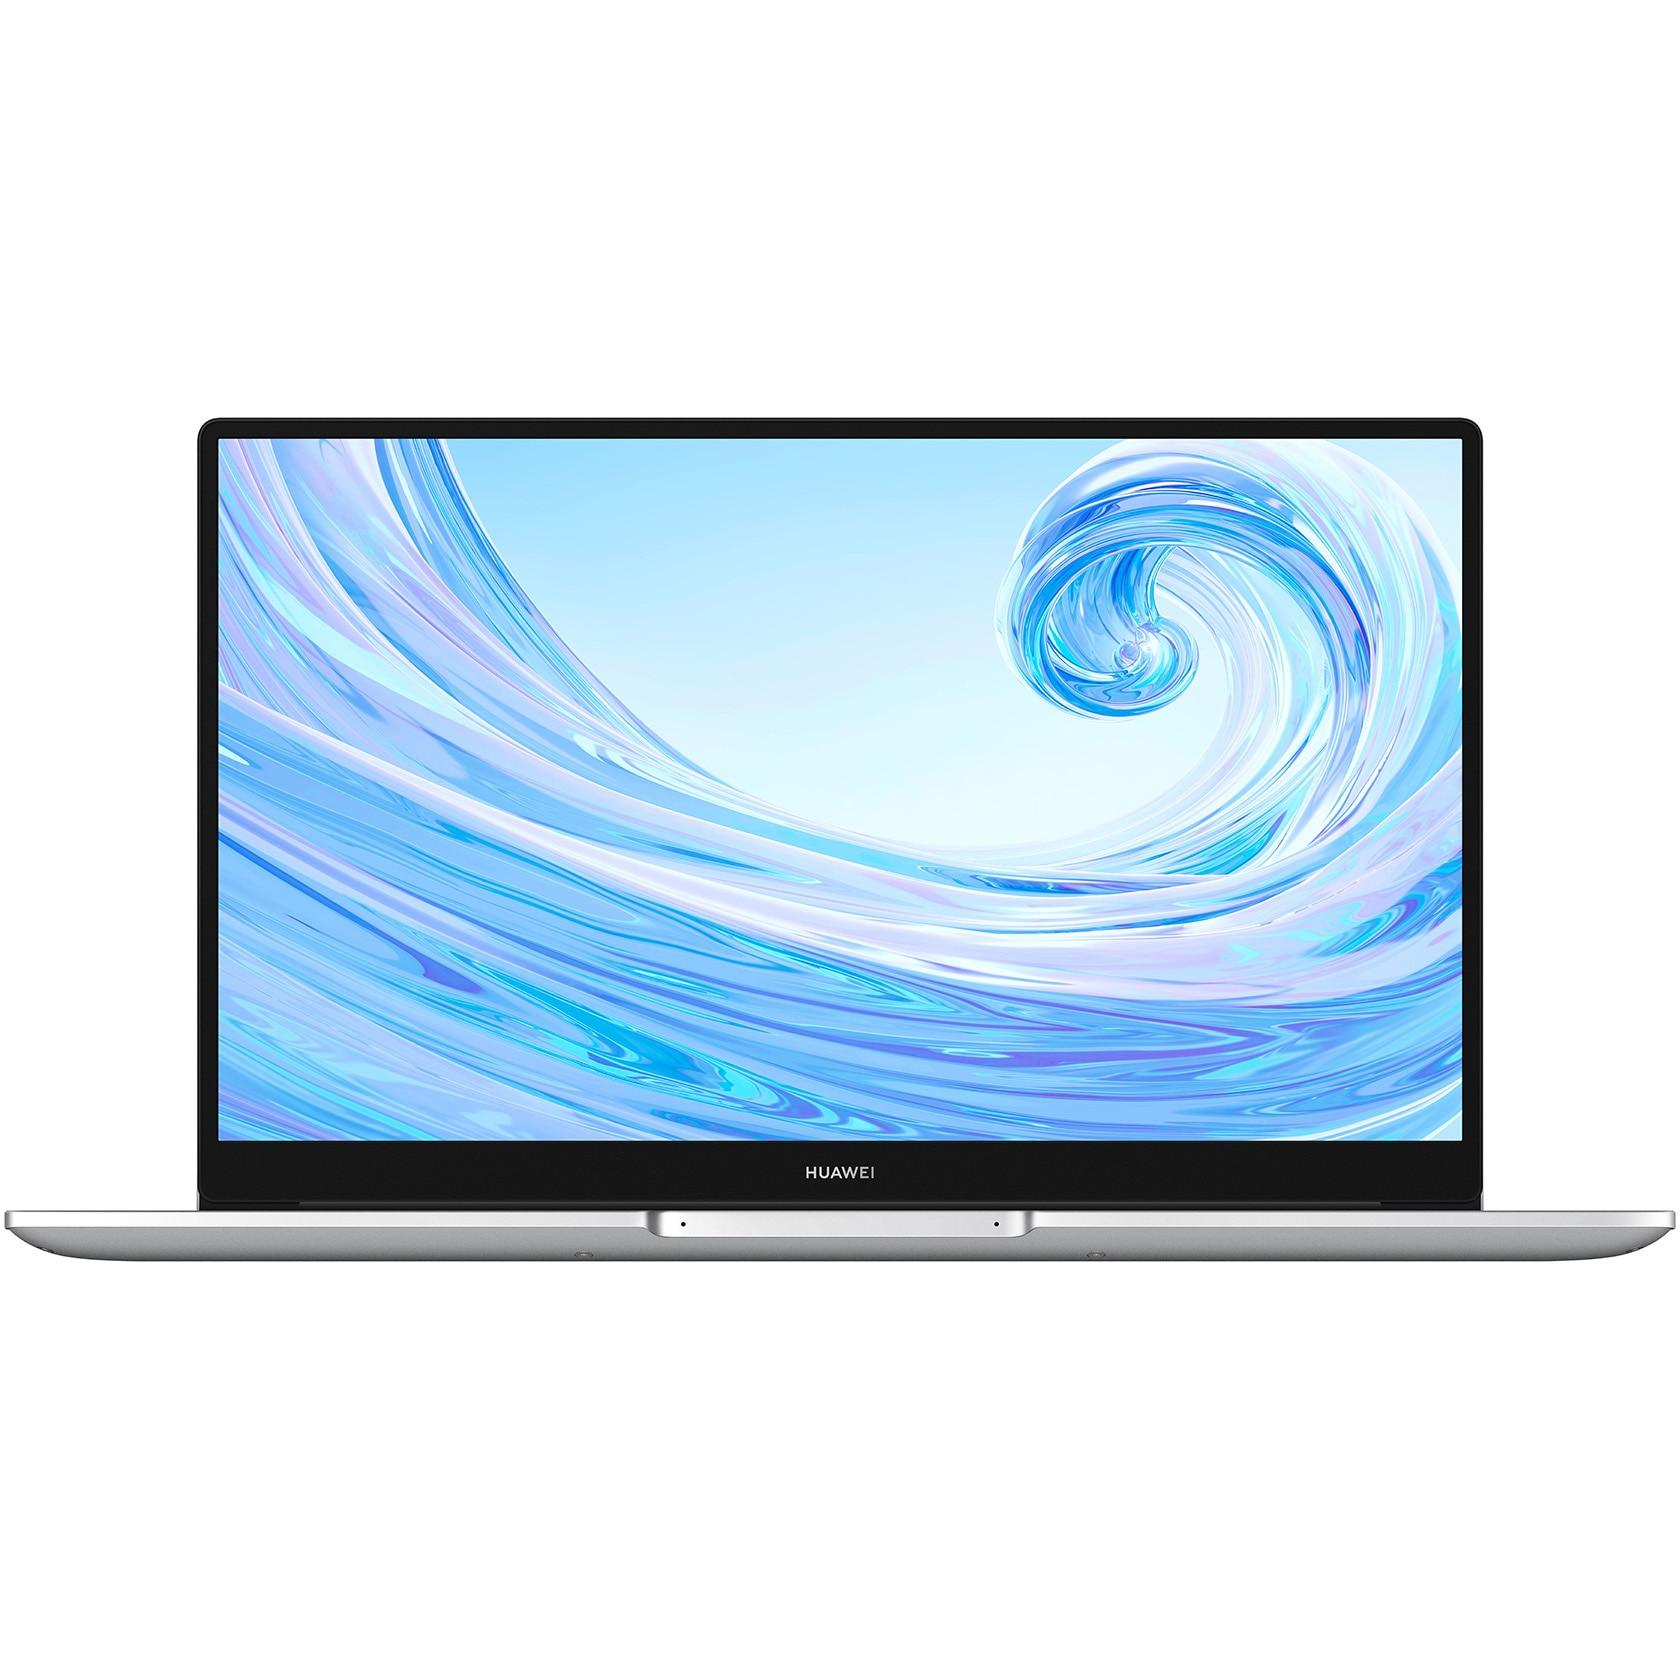 "Fotografie Laptop Huawei MateBook D15 2020 cu procesor AMD Ryzen™ 5 3500U pana la 3.70 GHz, 15.6"", Full HD, IPS, 8GB, 256GB SSD, Radeon™ Vega 8, Windows 10 Home, Mystic Silver"